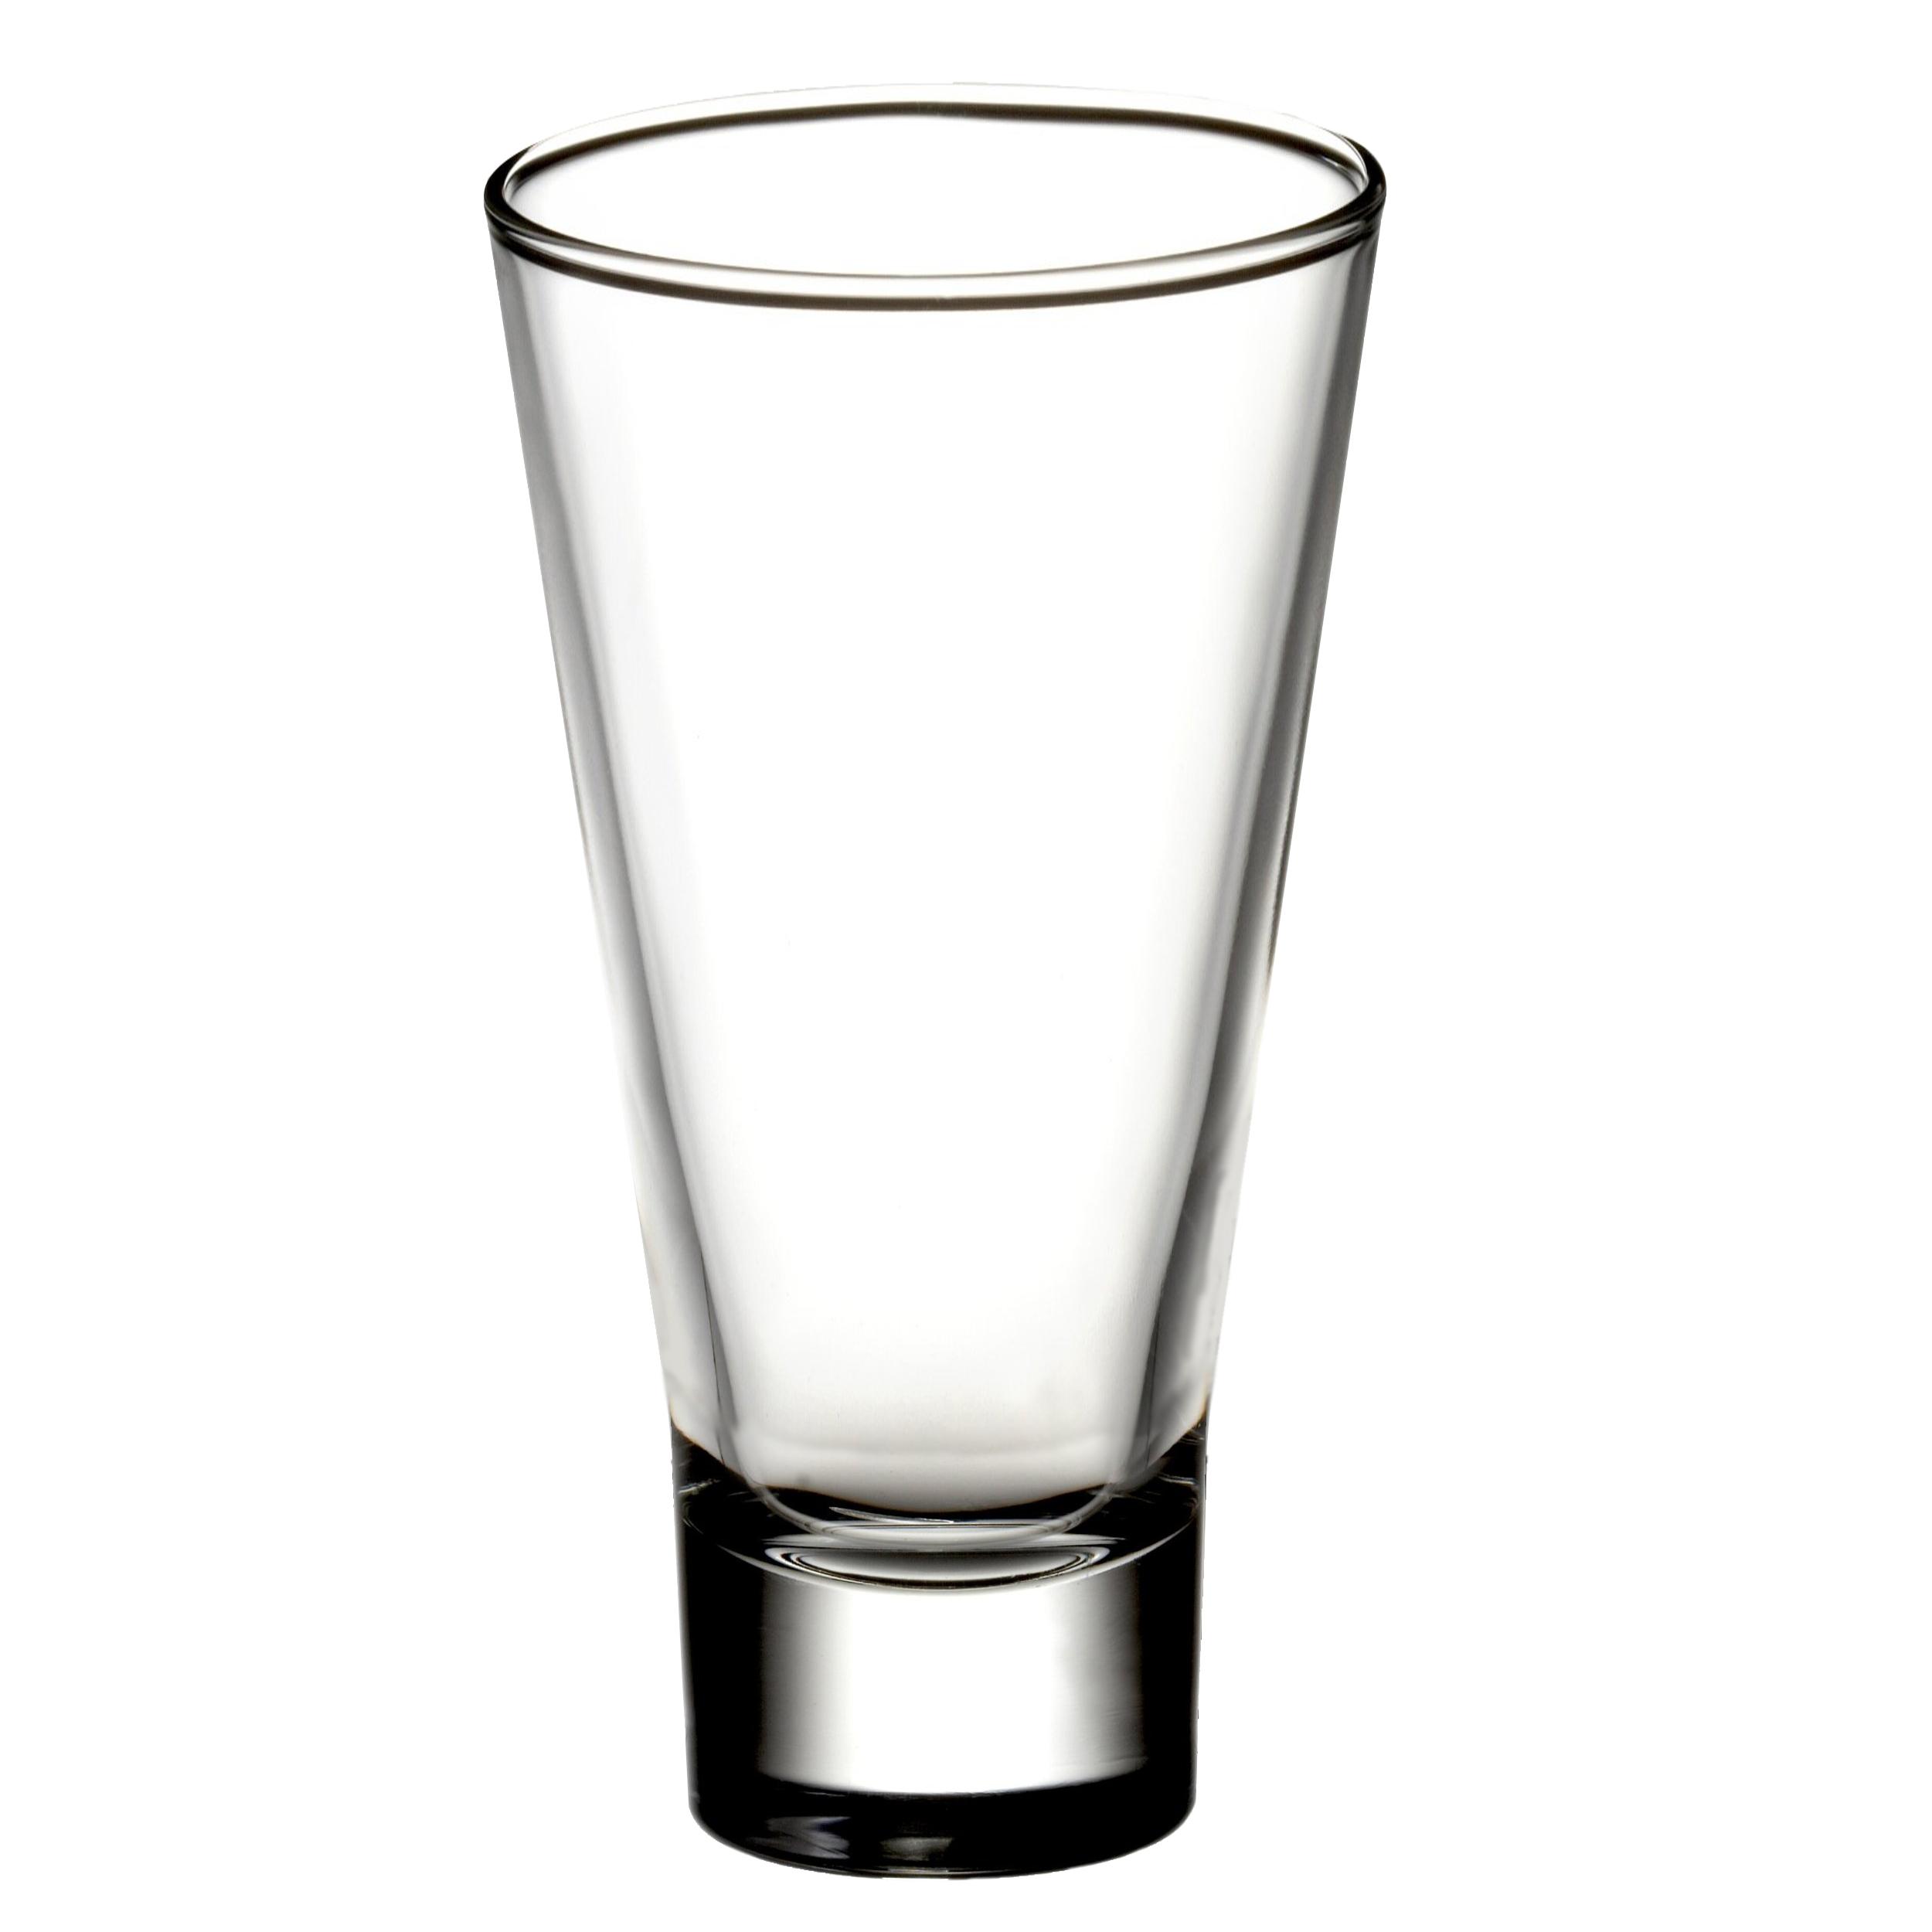 Bormioli Rocco Ypsilon 10.75 Ounce Party Beverage Tumbler, Set of 4